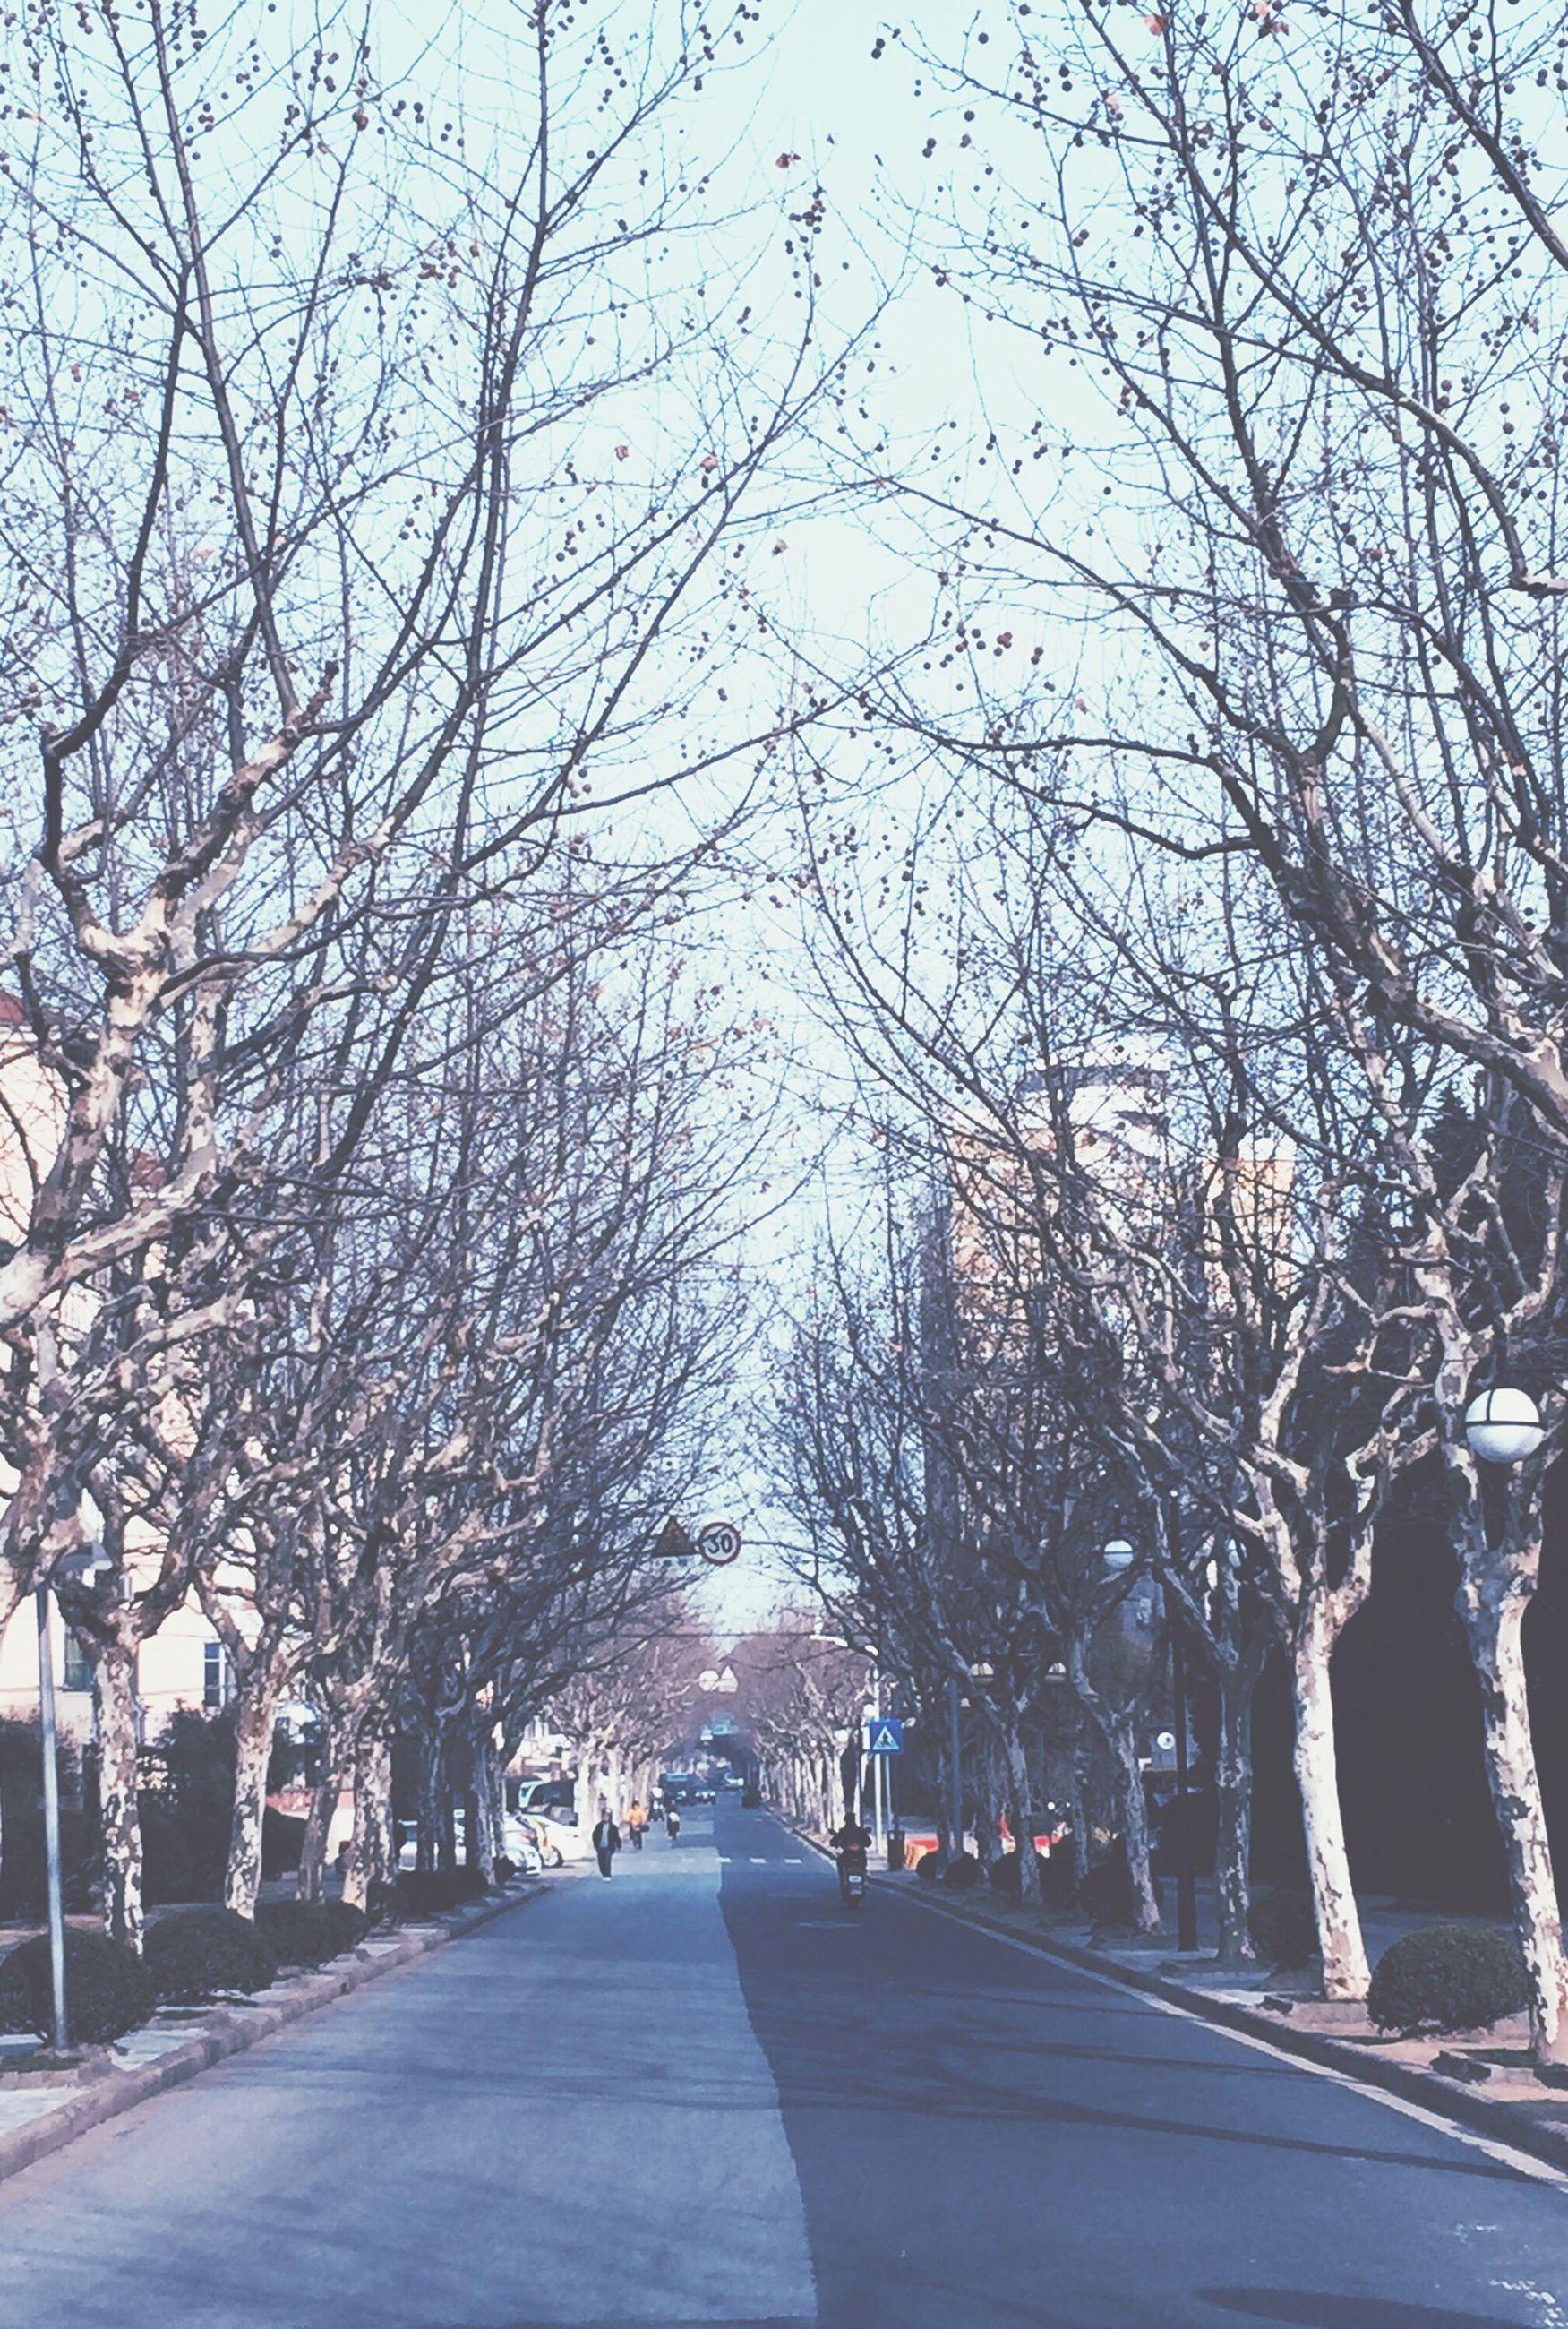 the way forward, tree, transportation, road, diminishing perspective, vanishing point, treelined, bare tree, road marking, street, branch, empty road, empty, sky, in a row, long, car, outdoors, nature, day